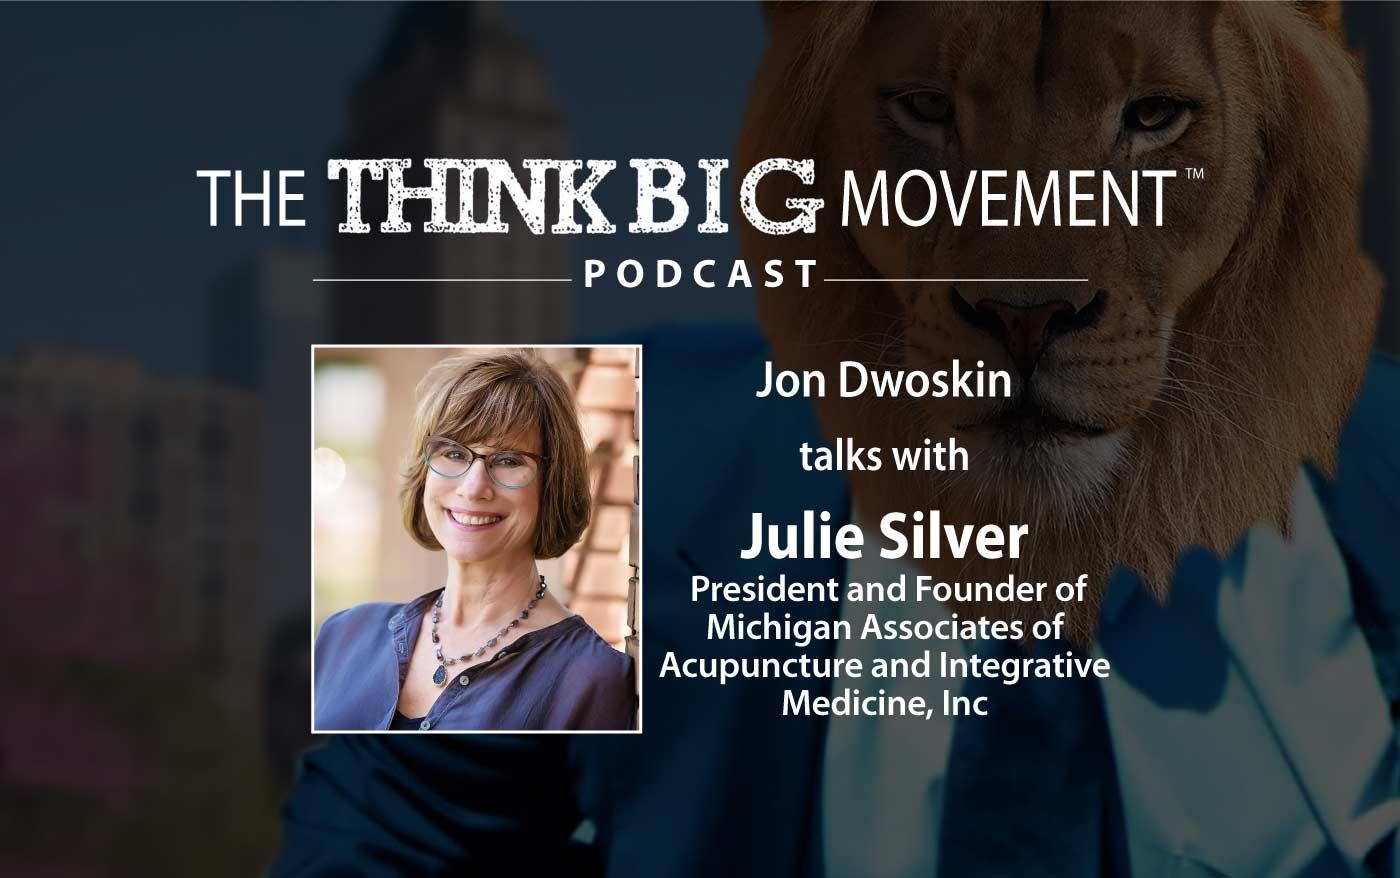 Think Big Movement Podcast - Jon Dwoskin Interviews Julie Silver